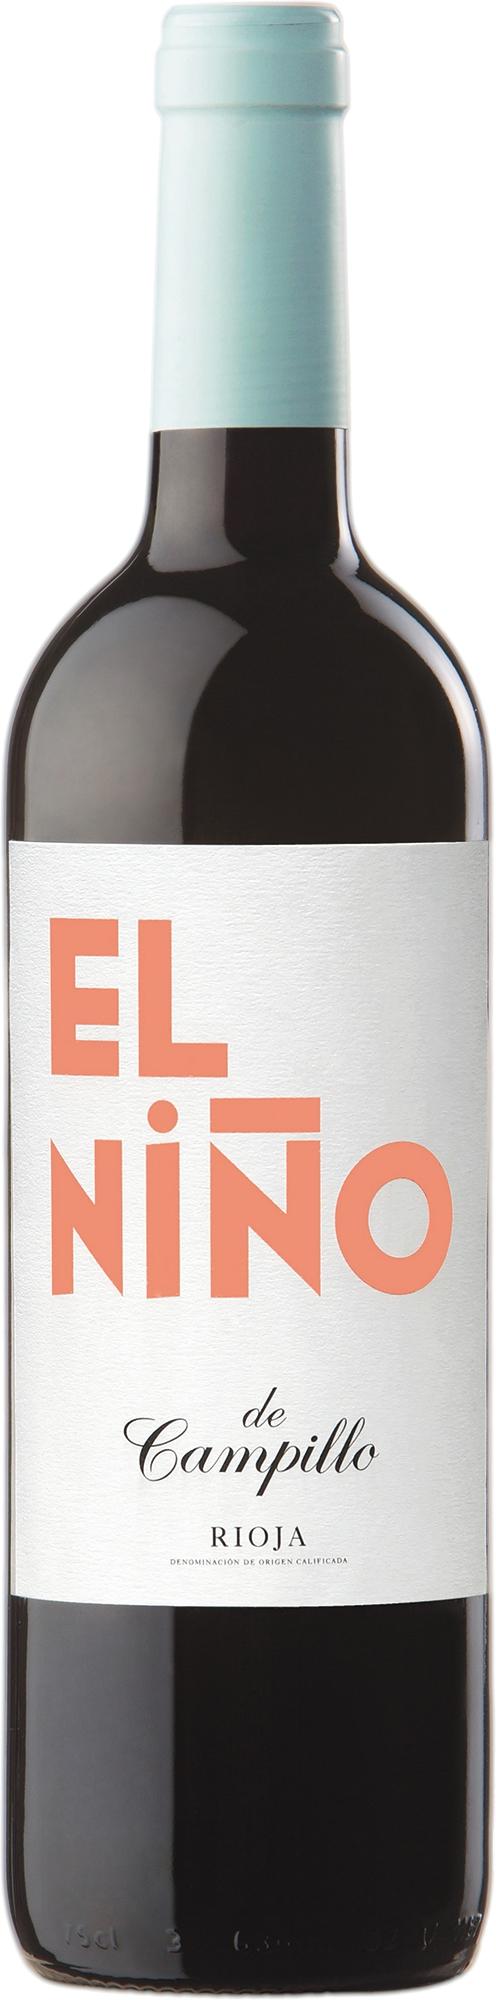 Produktbild på El Niño de Campillo